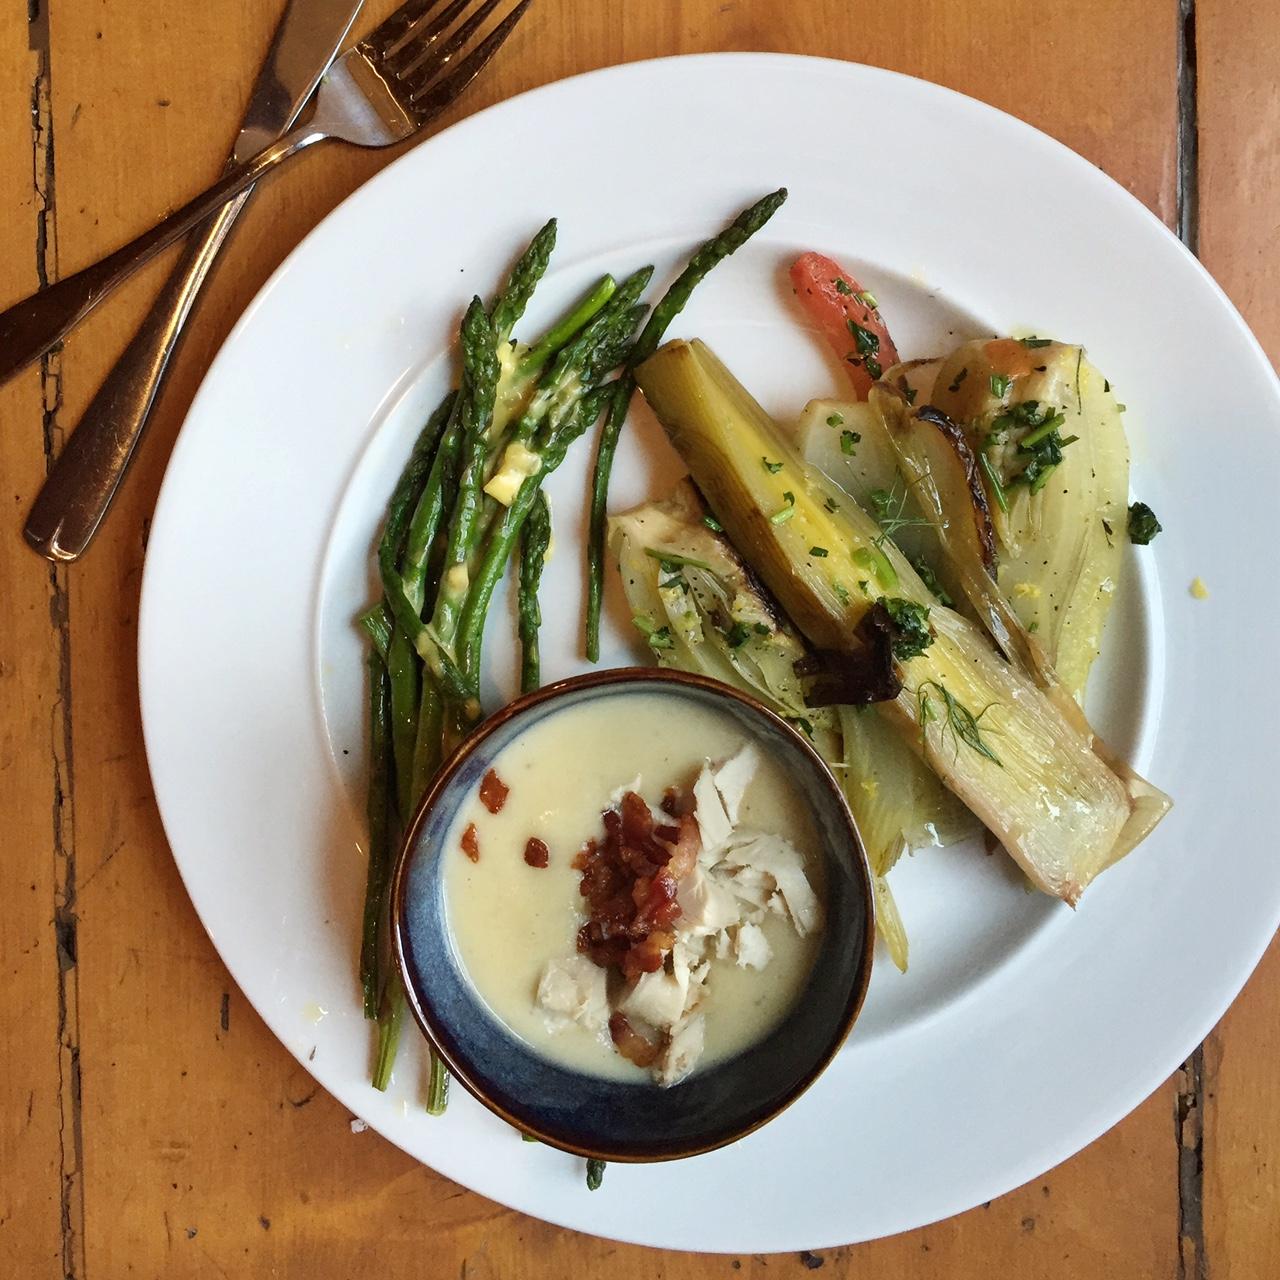 culinary school lunch • theVintageMixer.com #culinaryschool